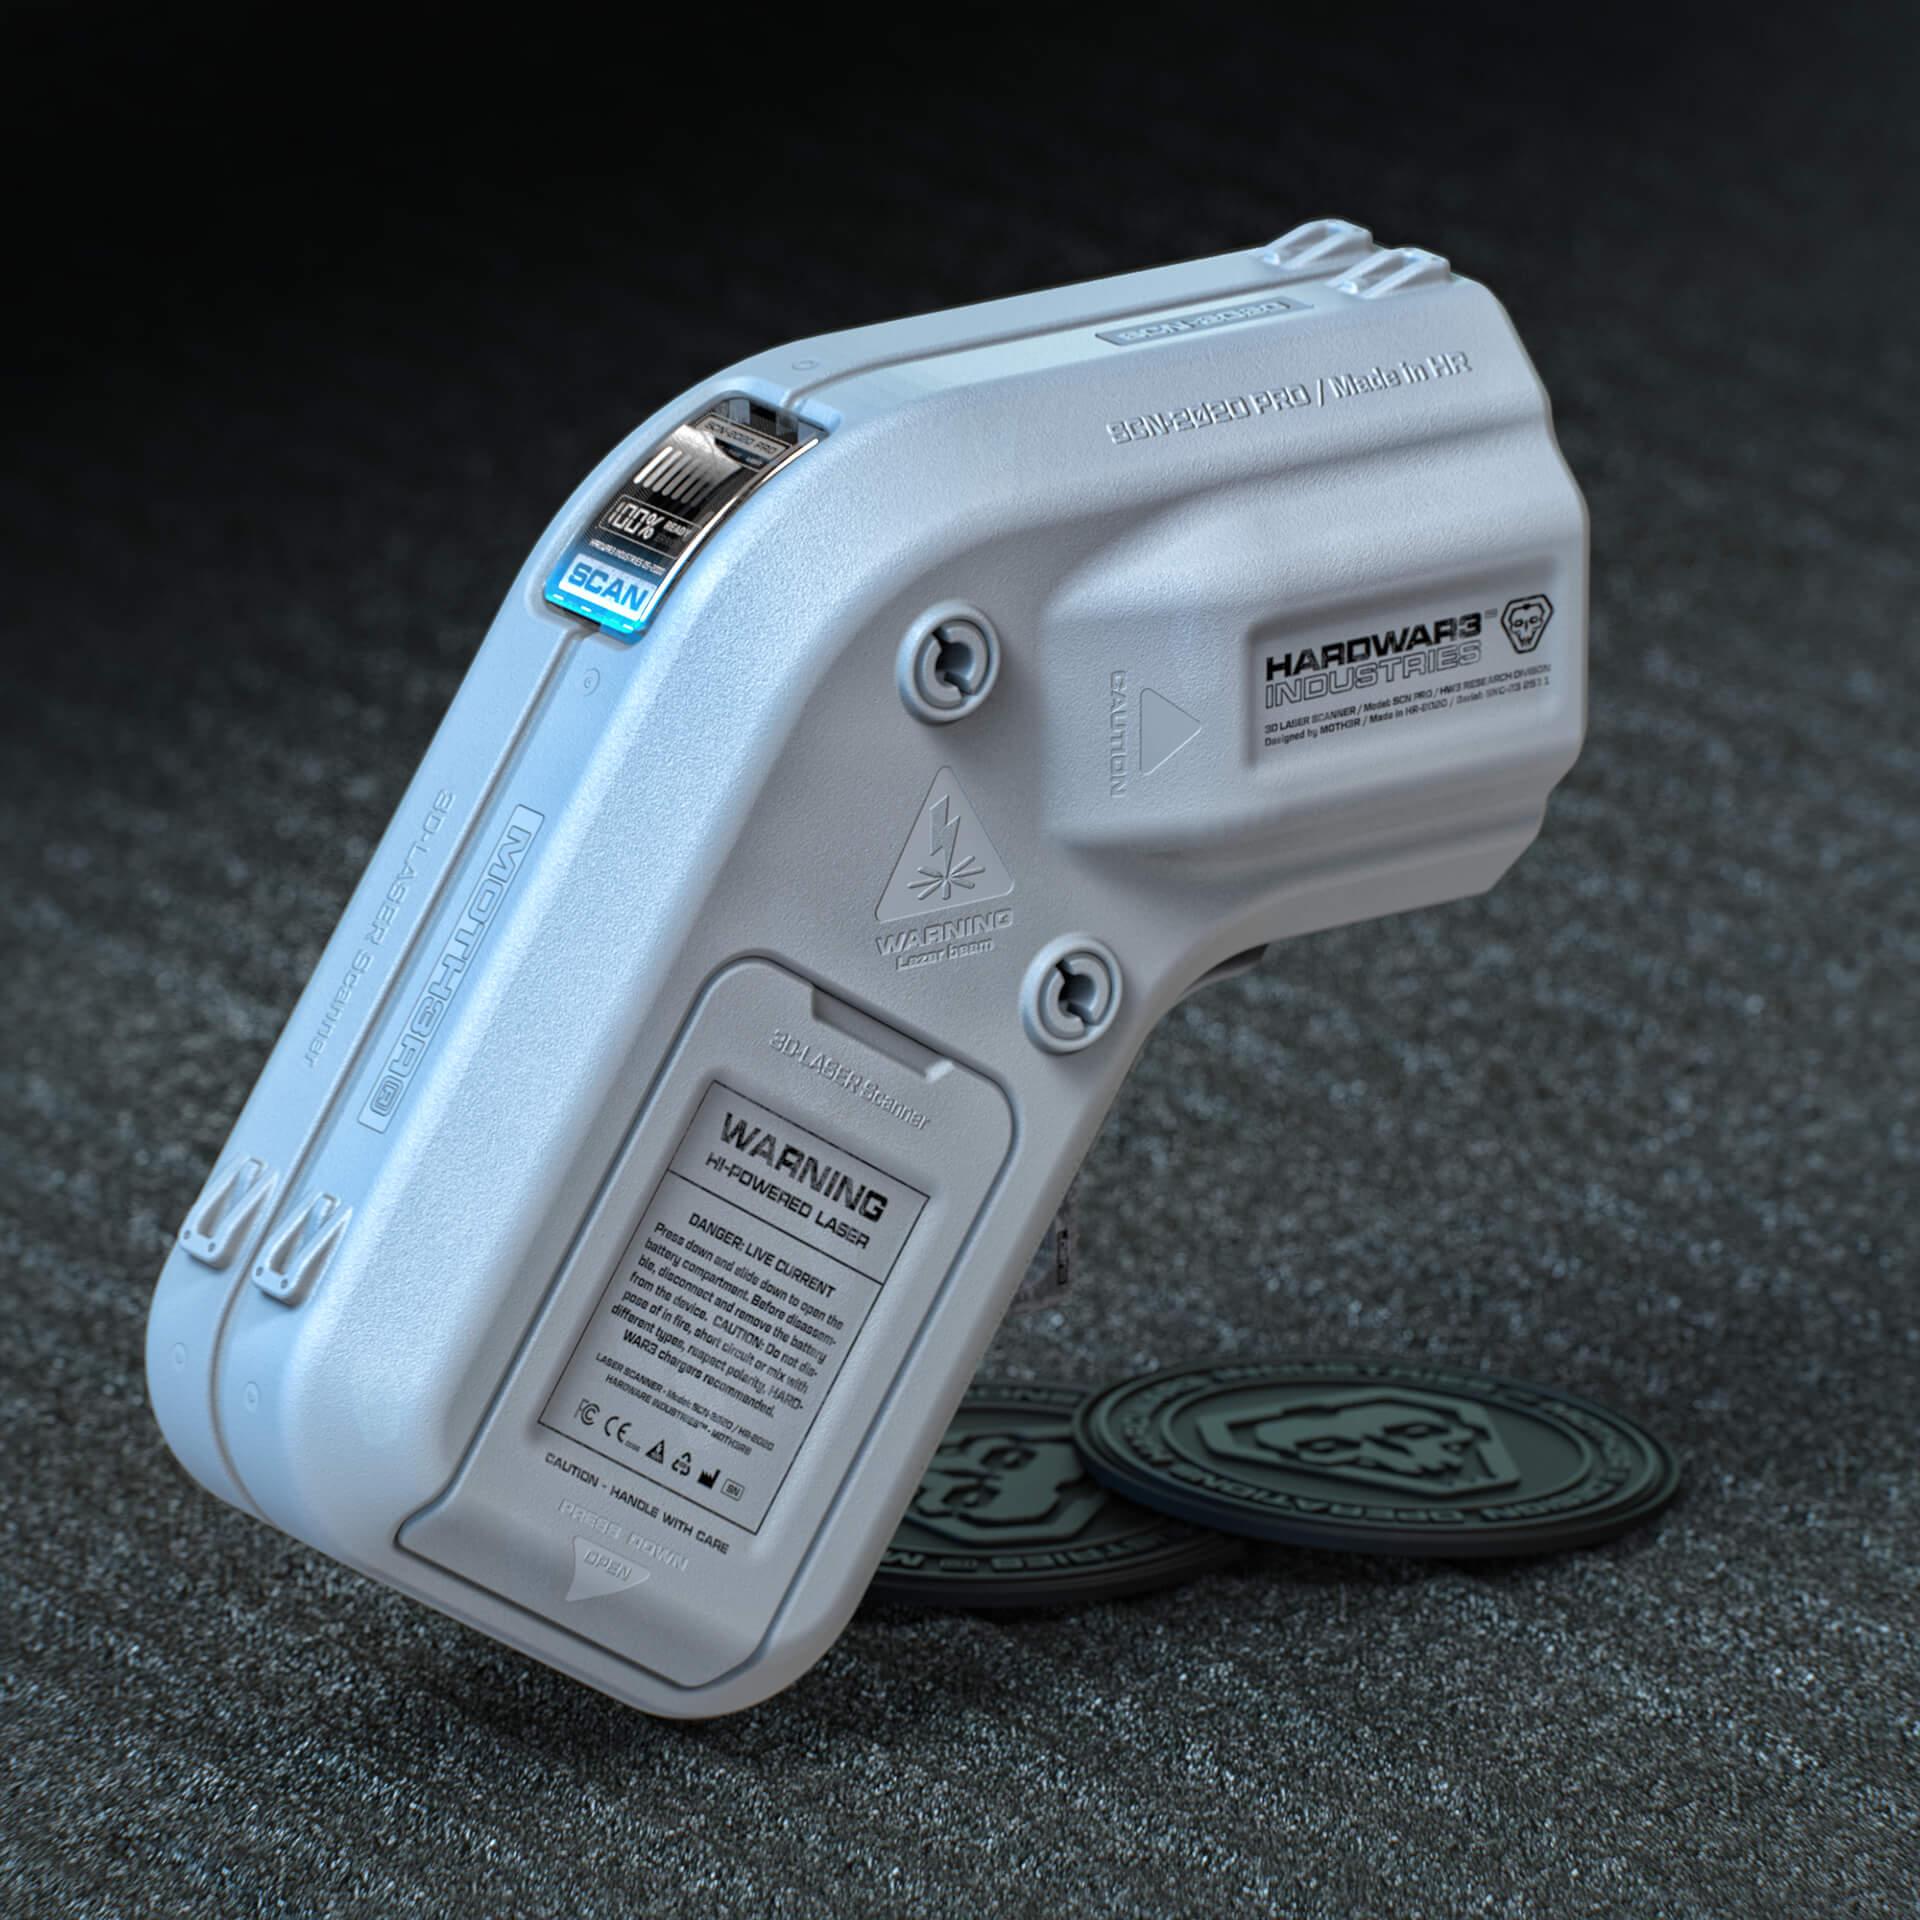 Scanner-001.91-Clean